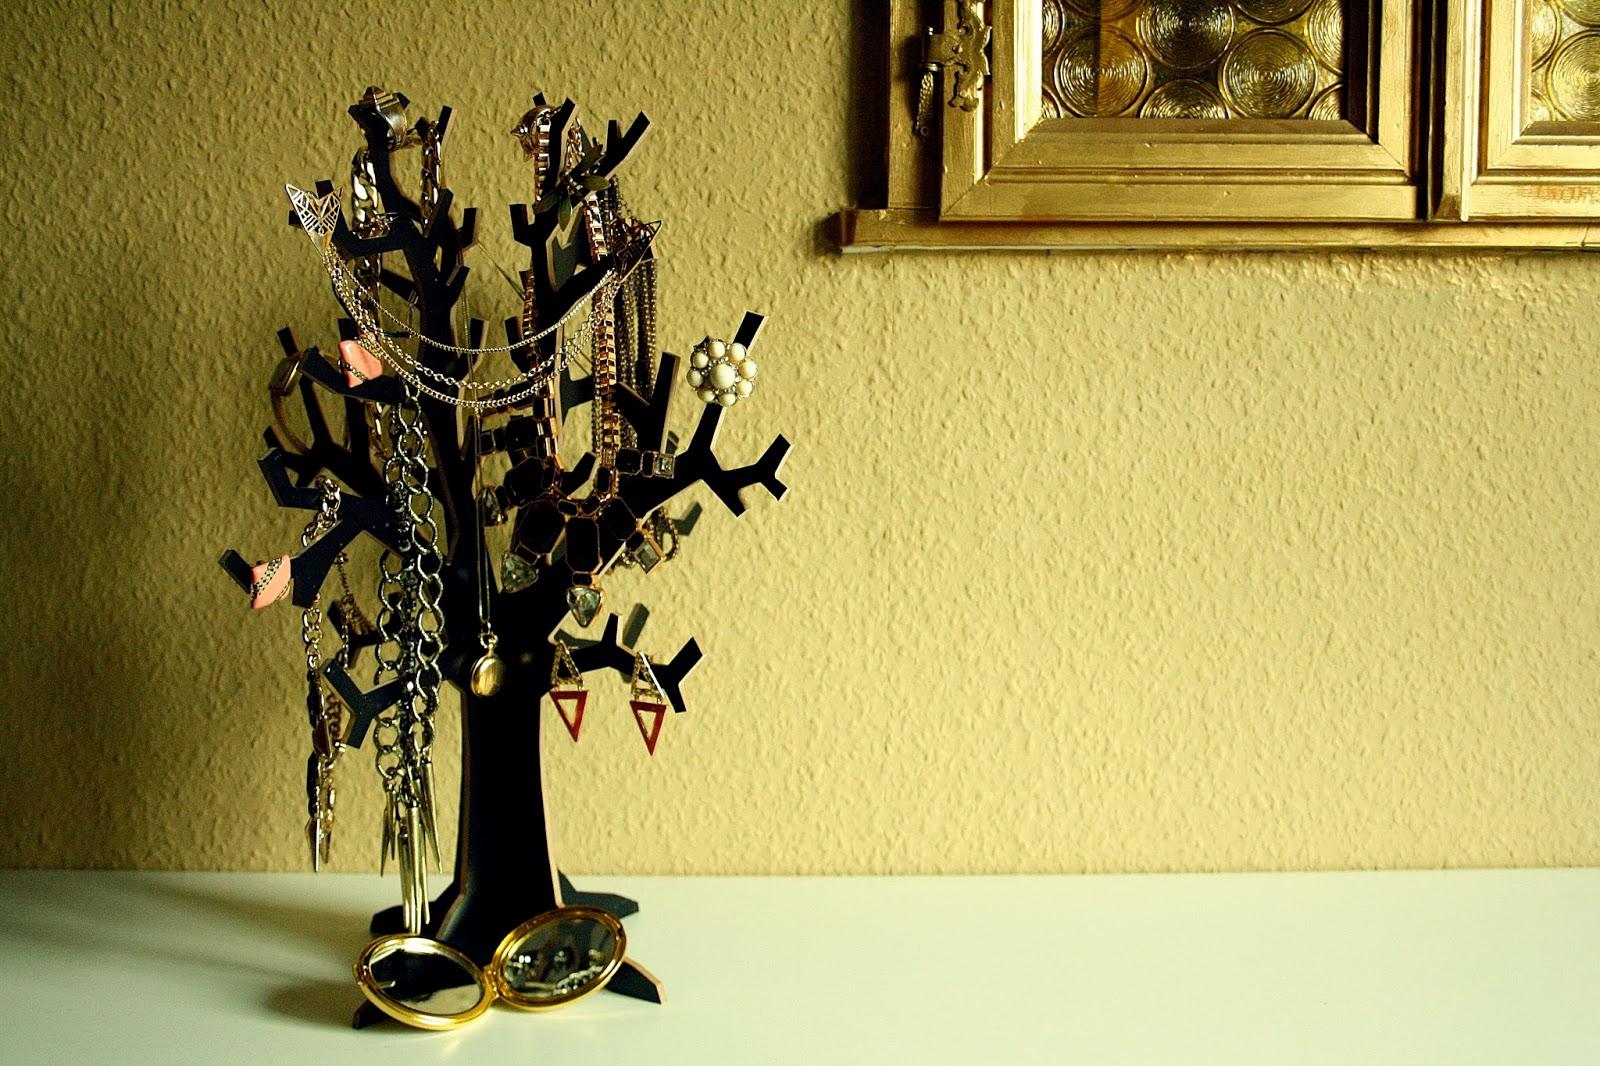 fraukleid schmuckbaum fashion for home challenge. Black Bedroom Furniture Sets. Home Design Ideas